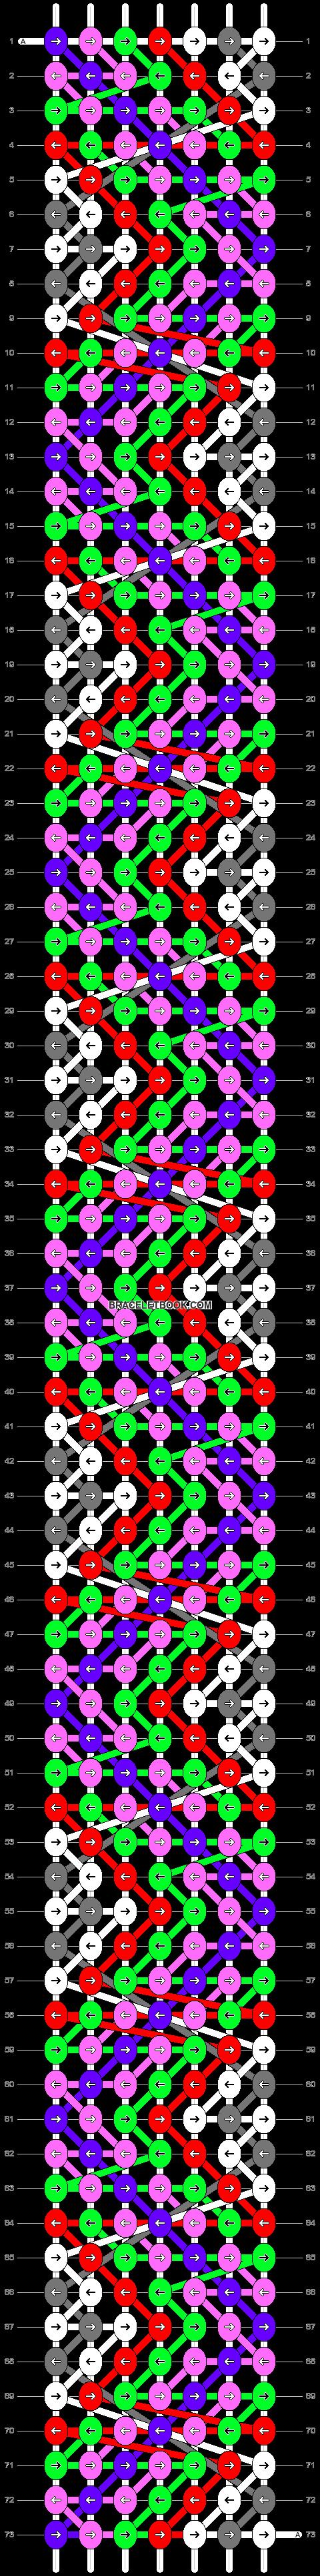 Alpha Pattern #22288 added by nastyapan